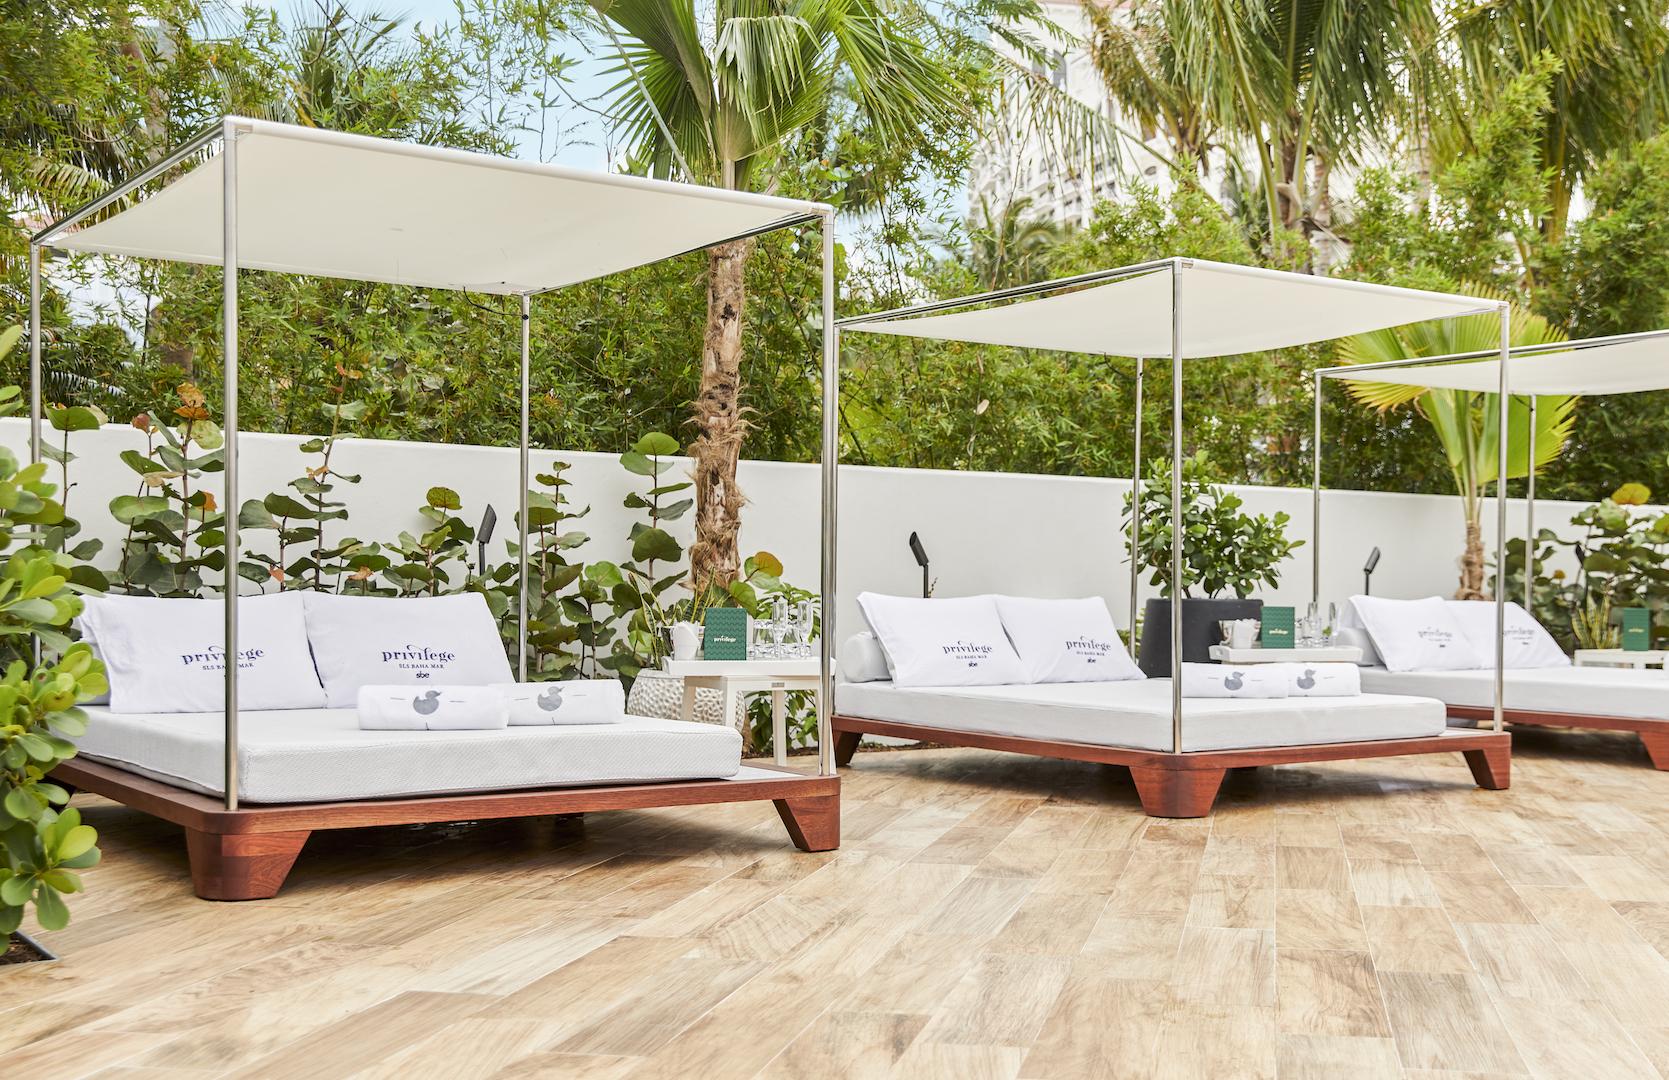 Seora - SLS Baha Mar Grand Belvedere day beds - Masha Shapiro Agency UK.jpg